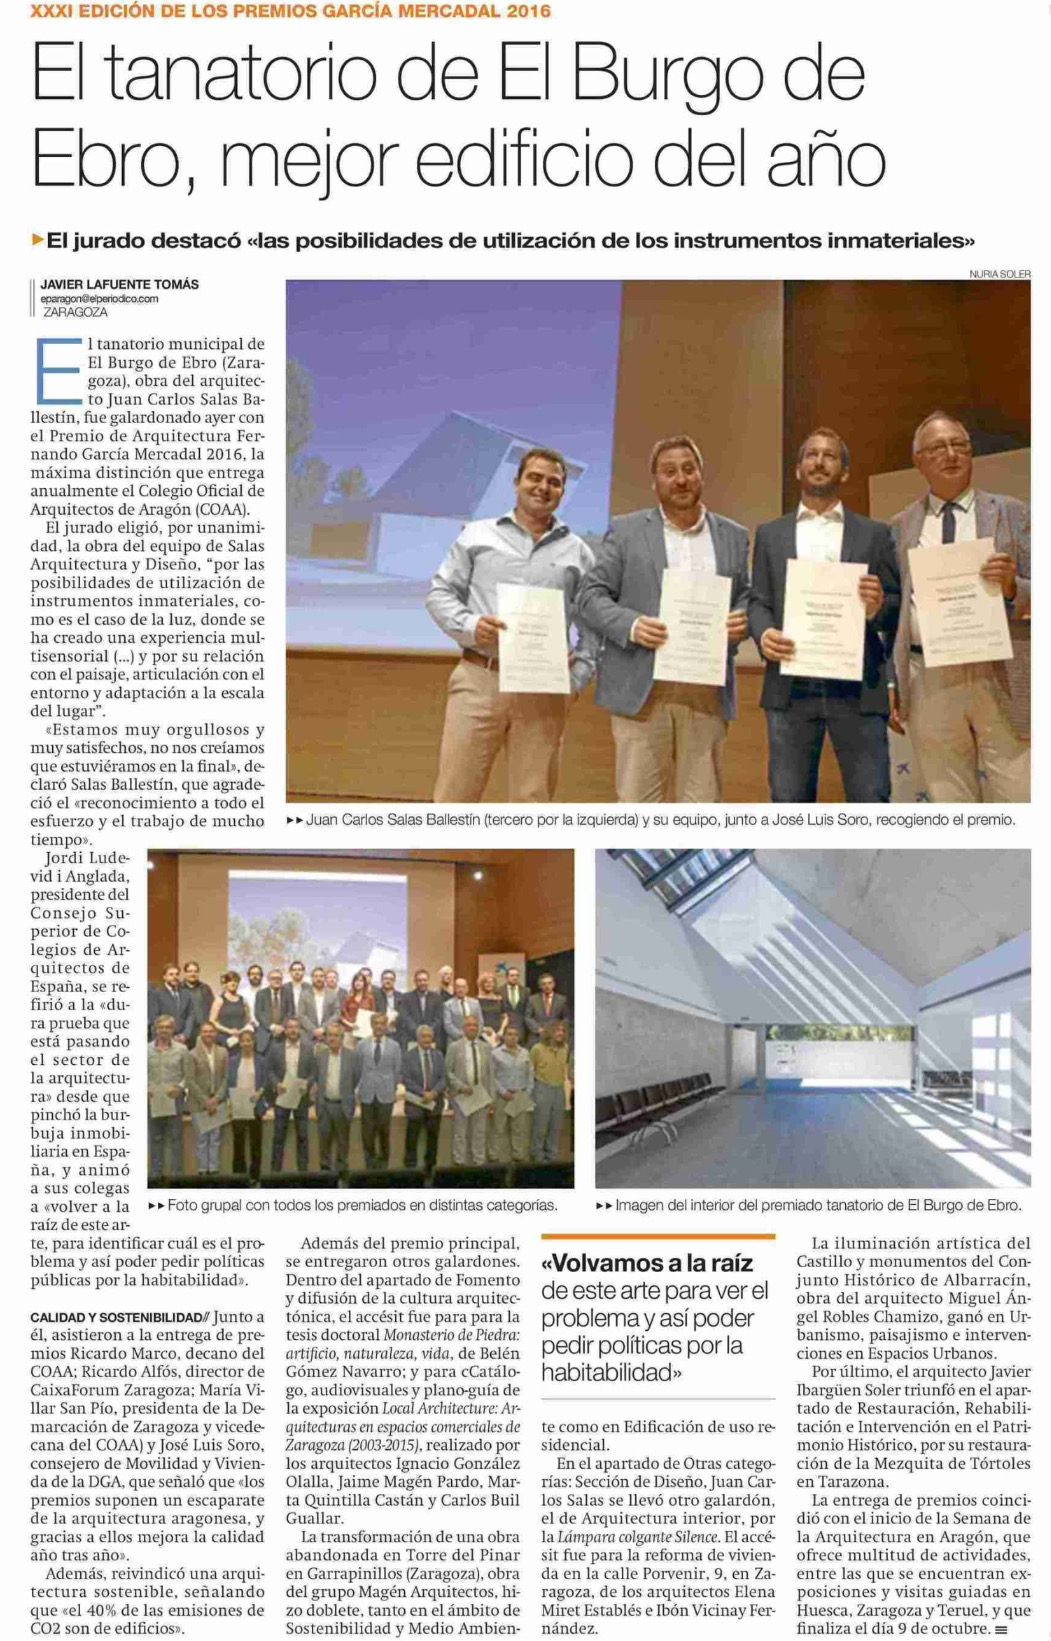 premio_arquitecto_tanatorio_04102016_2